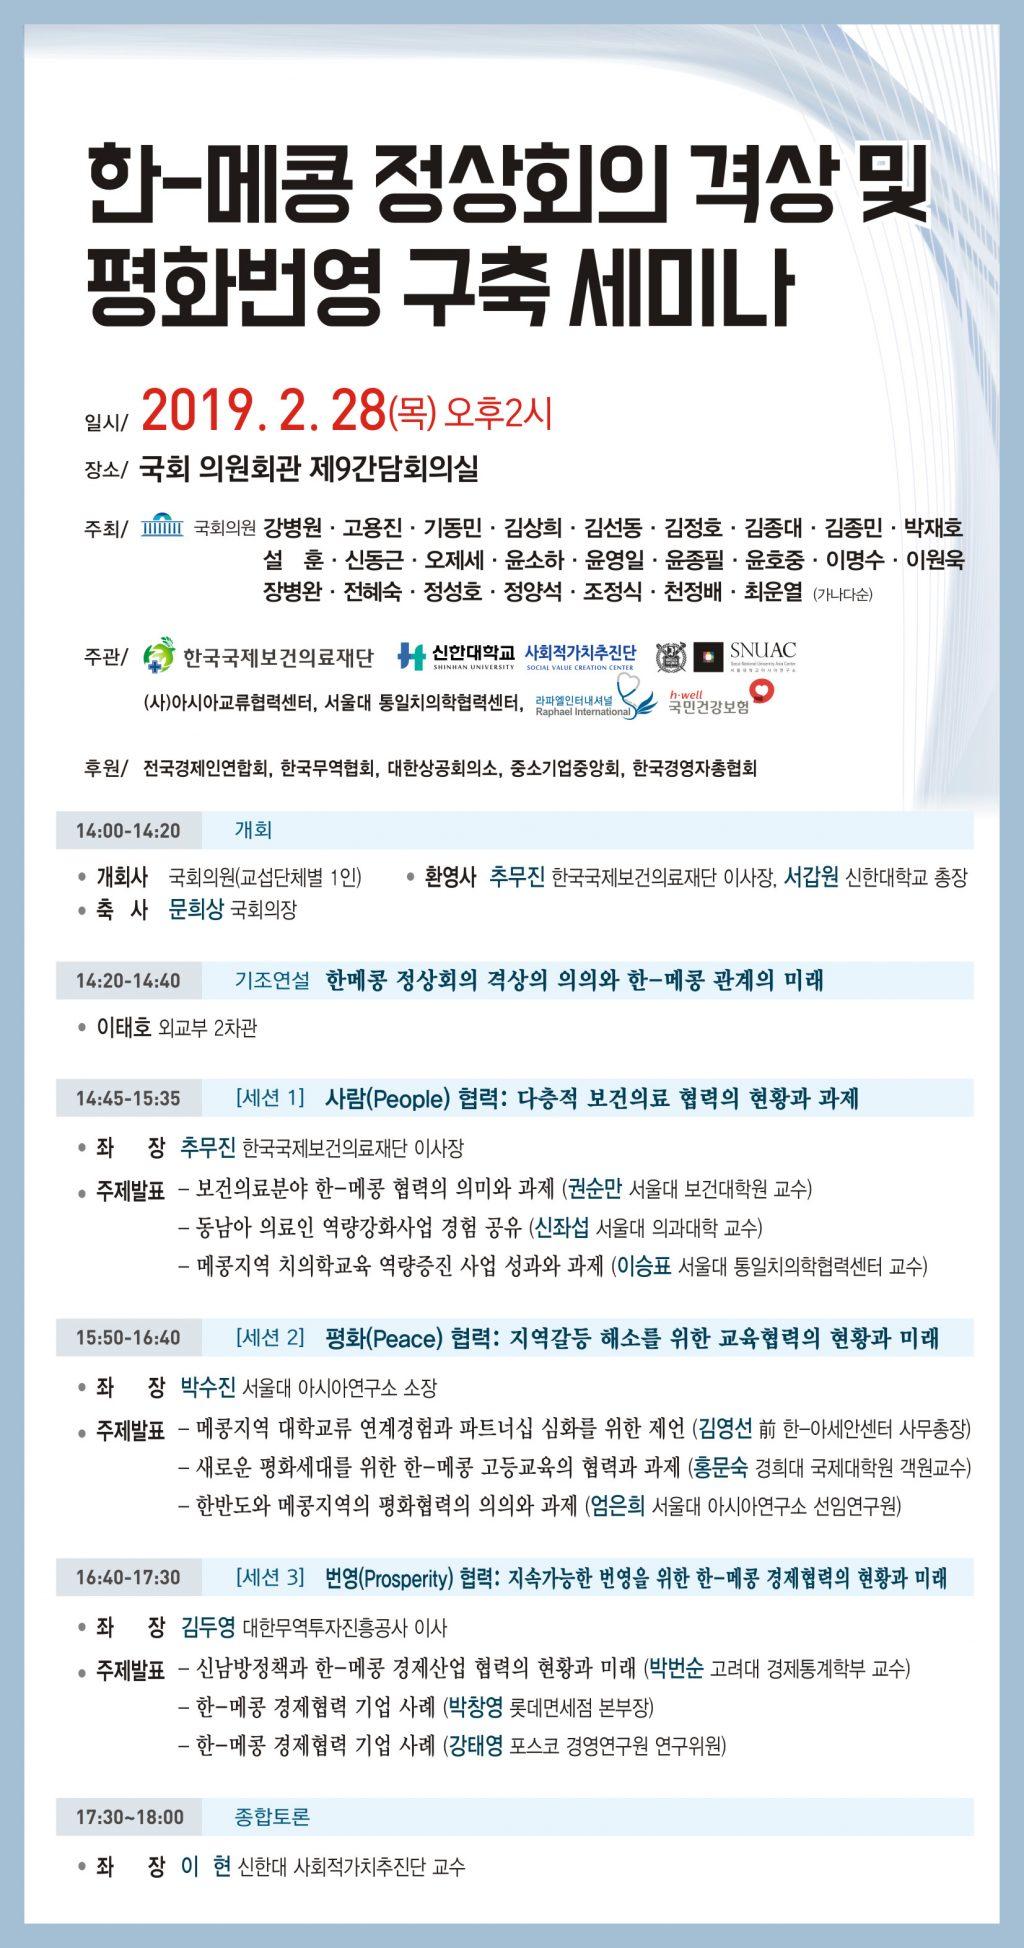 Korea-Mekong Summit and Peace-Prosperity Promotion Seminar